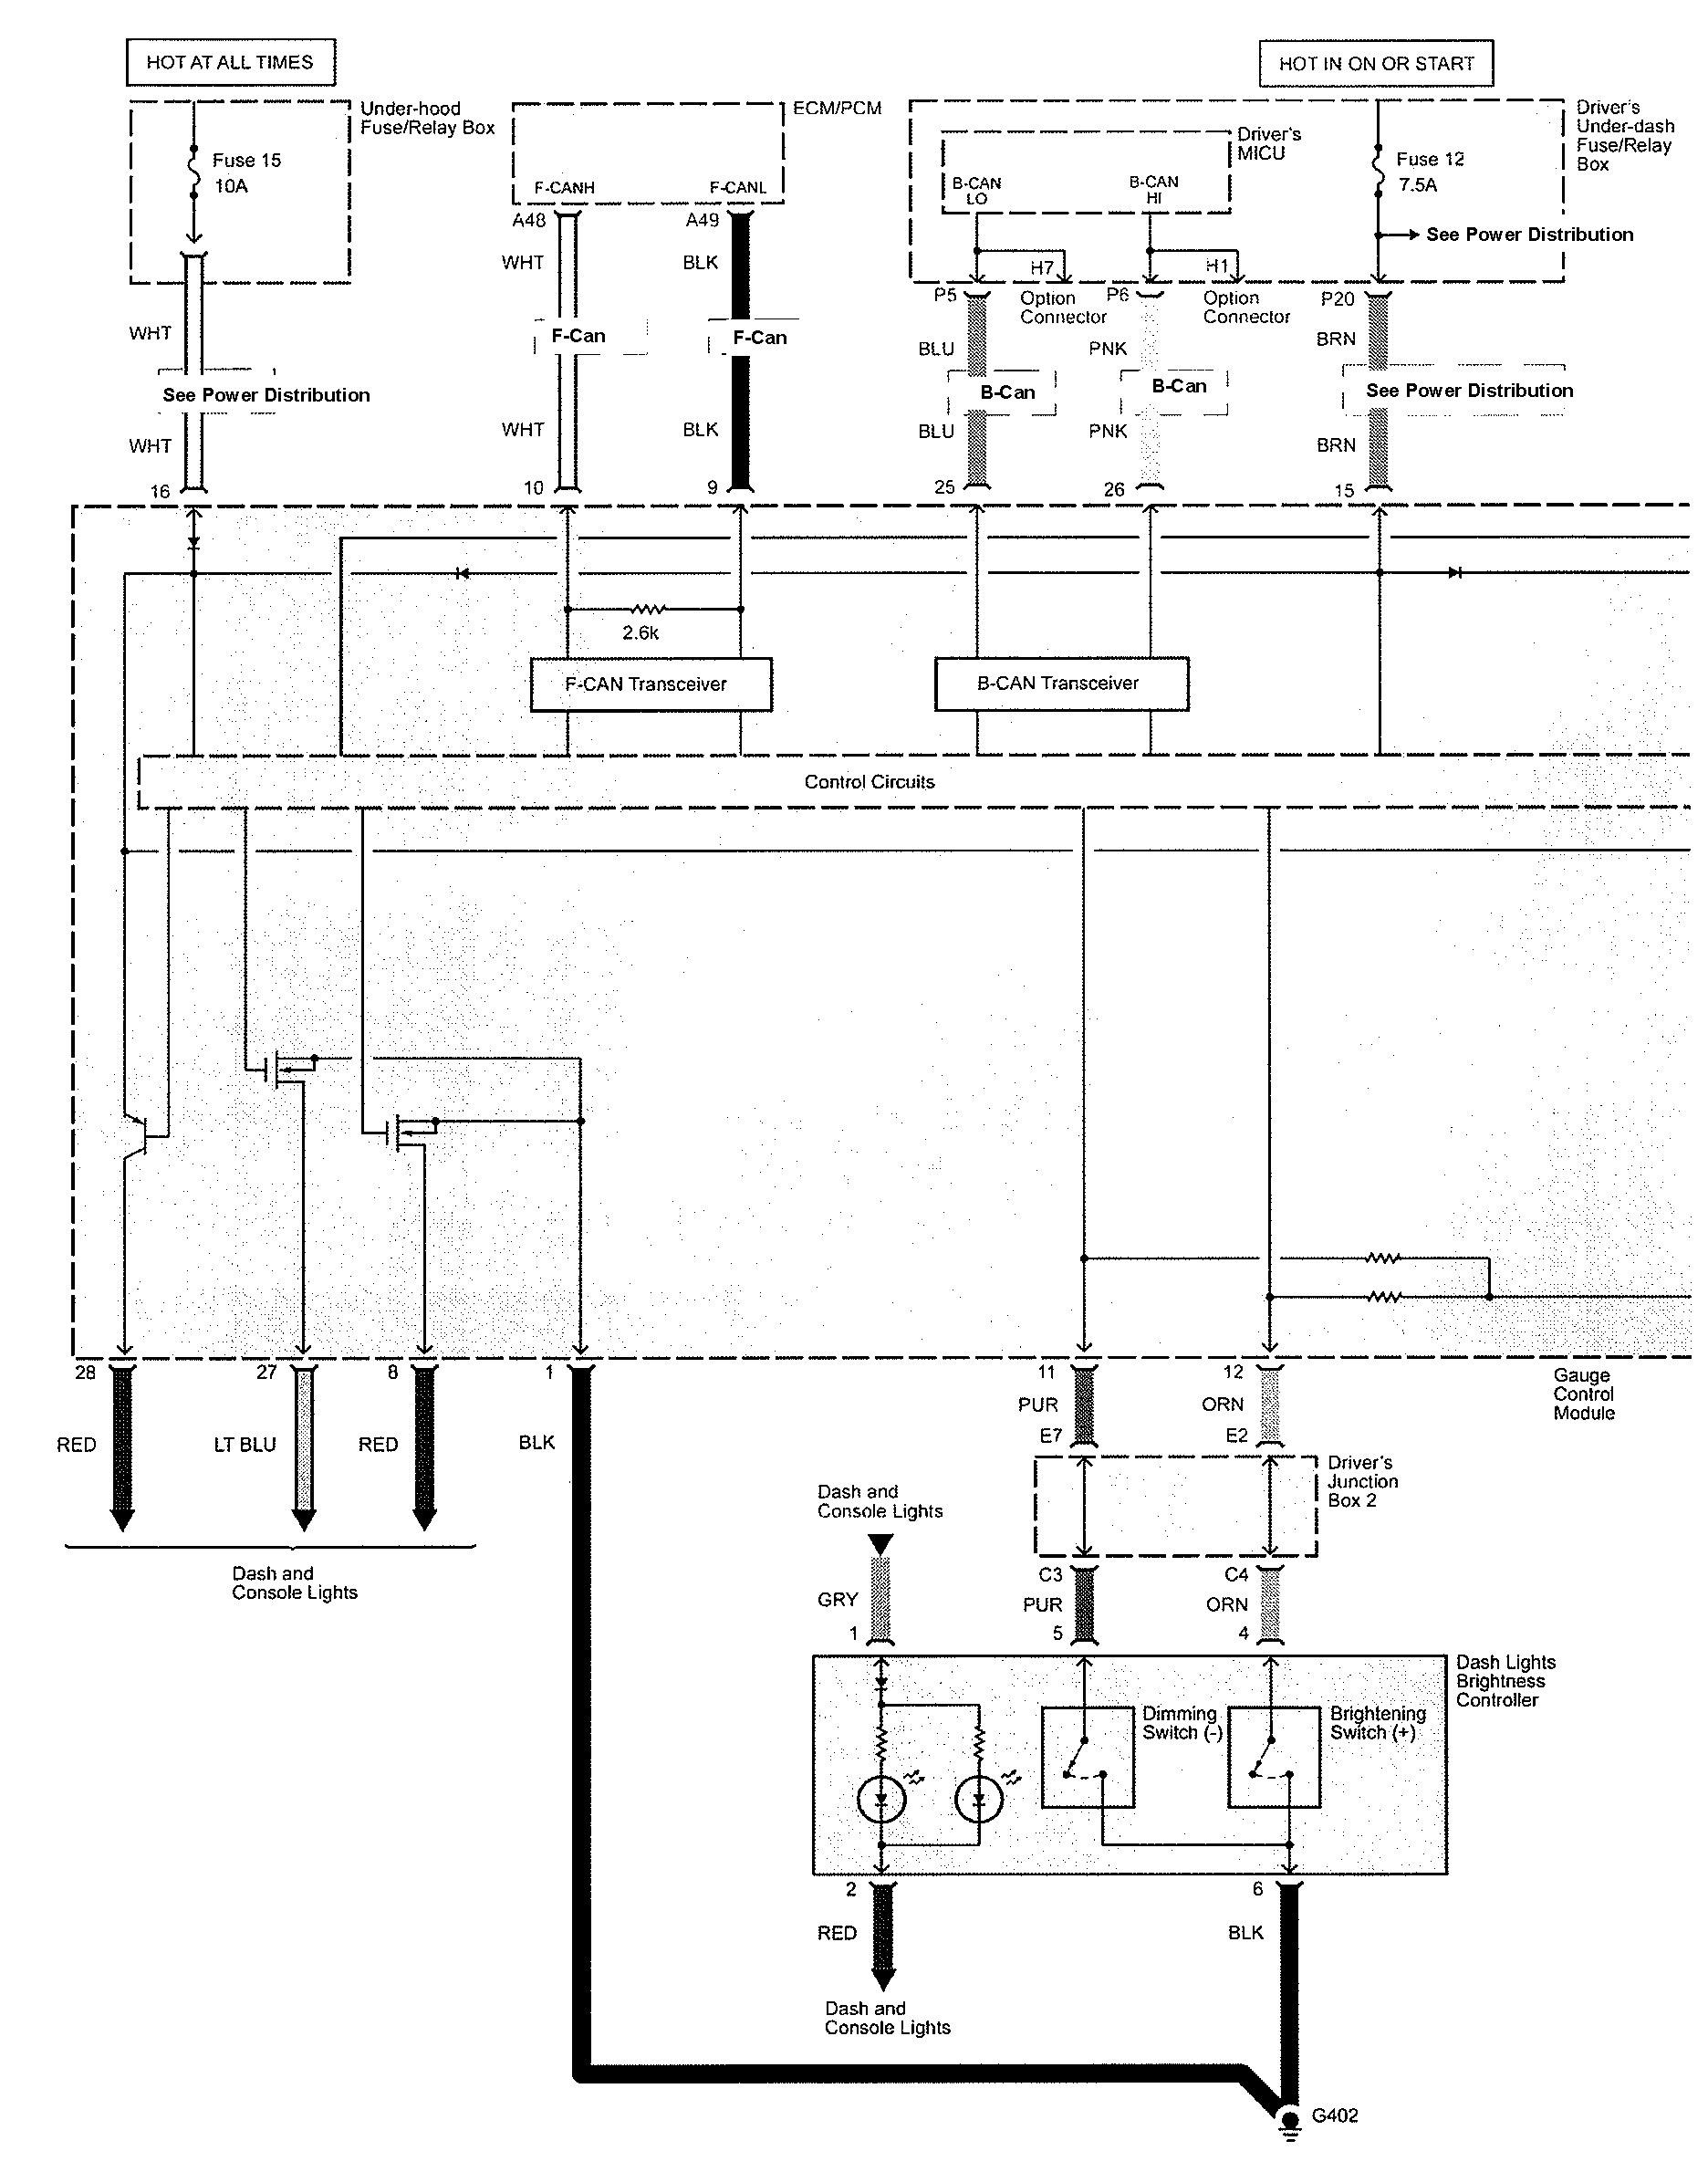 Acura TL (2009 - 2010) - wiring diagrams - instrumentation -  Carknowledge.info   Acura Tl 2010 Wiring Diagram      Carknowledge.info